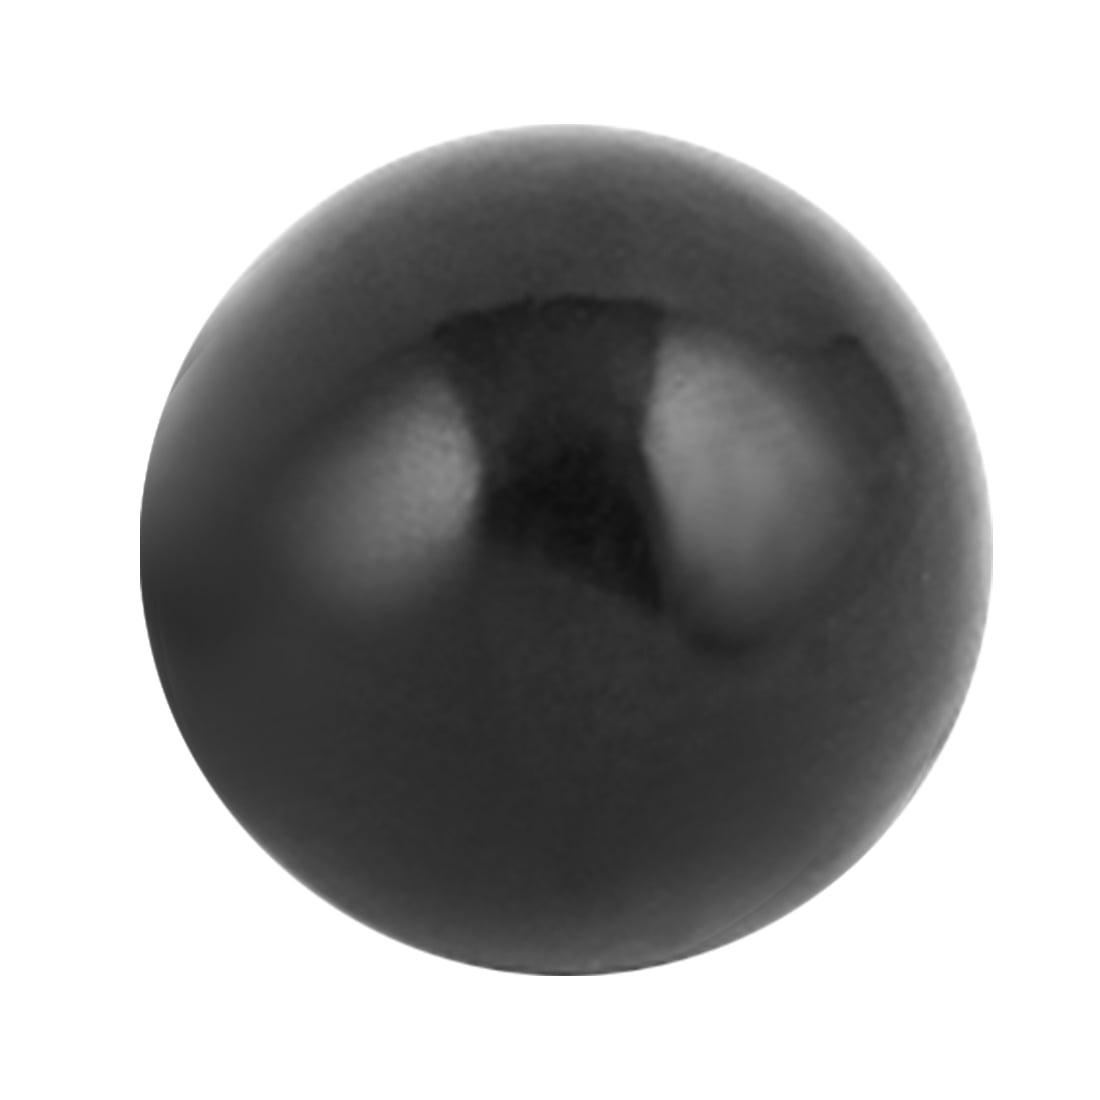 5Pcs M8 x 28mm Plastic Thread 30mm Diameter Spherical Ball Lever Knob Red